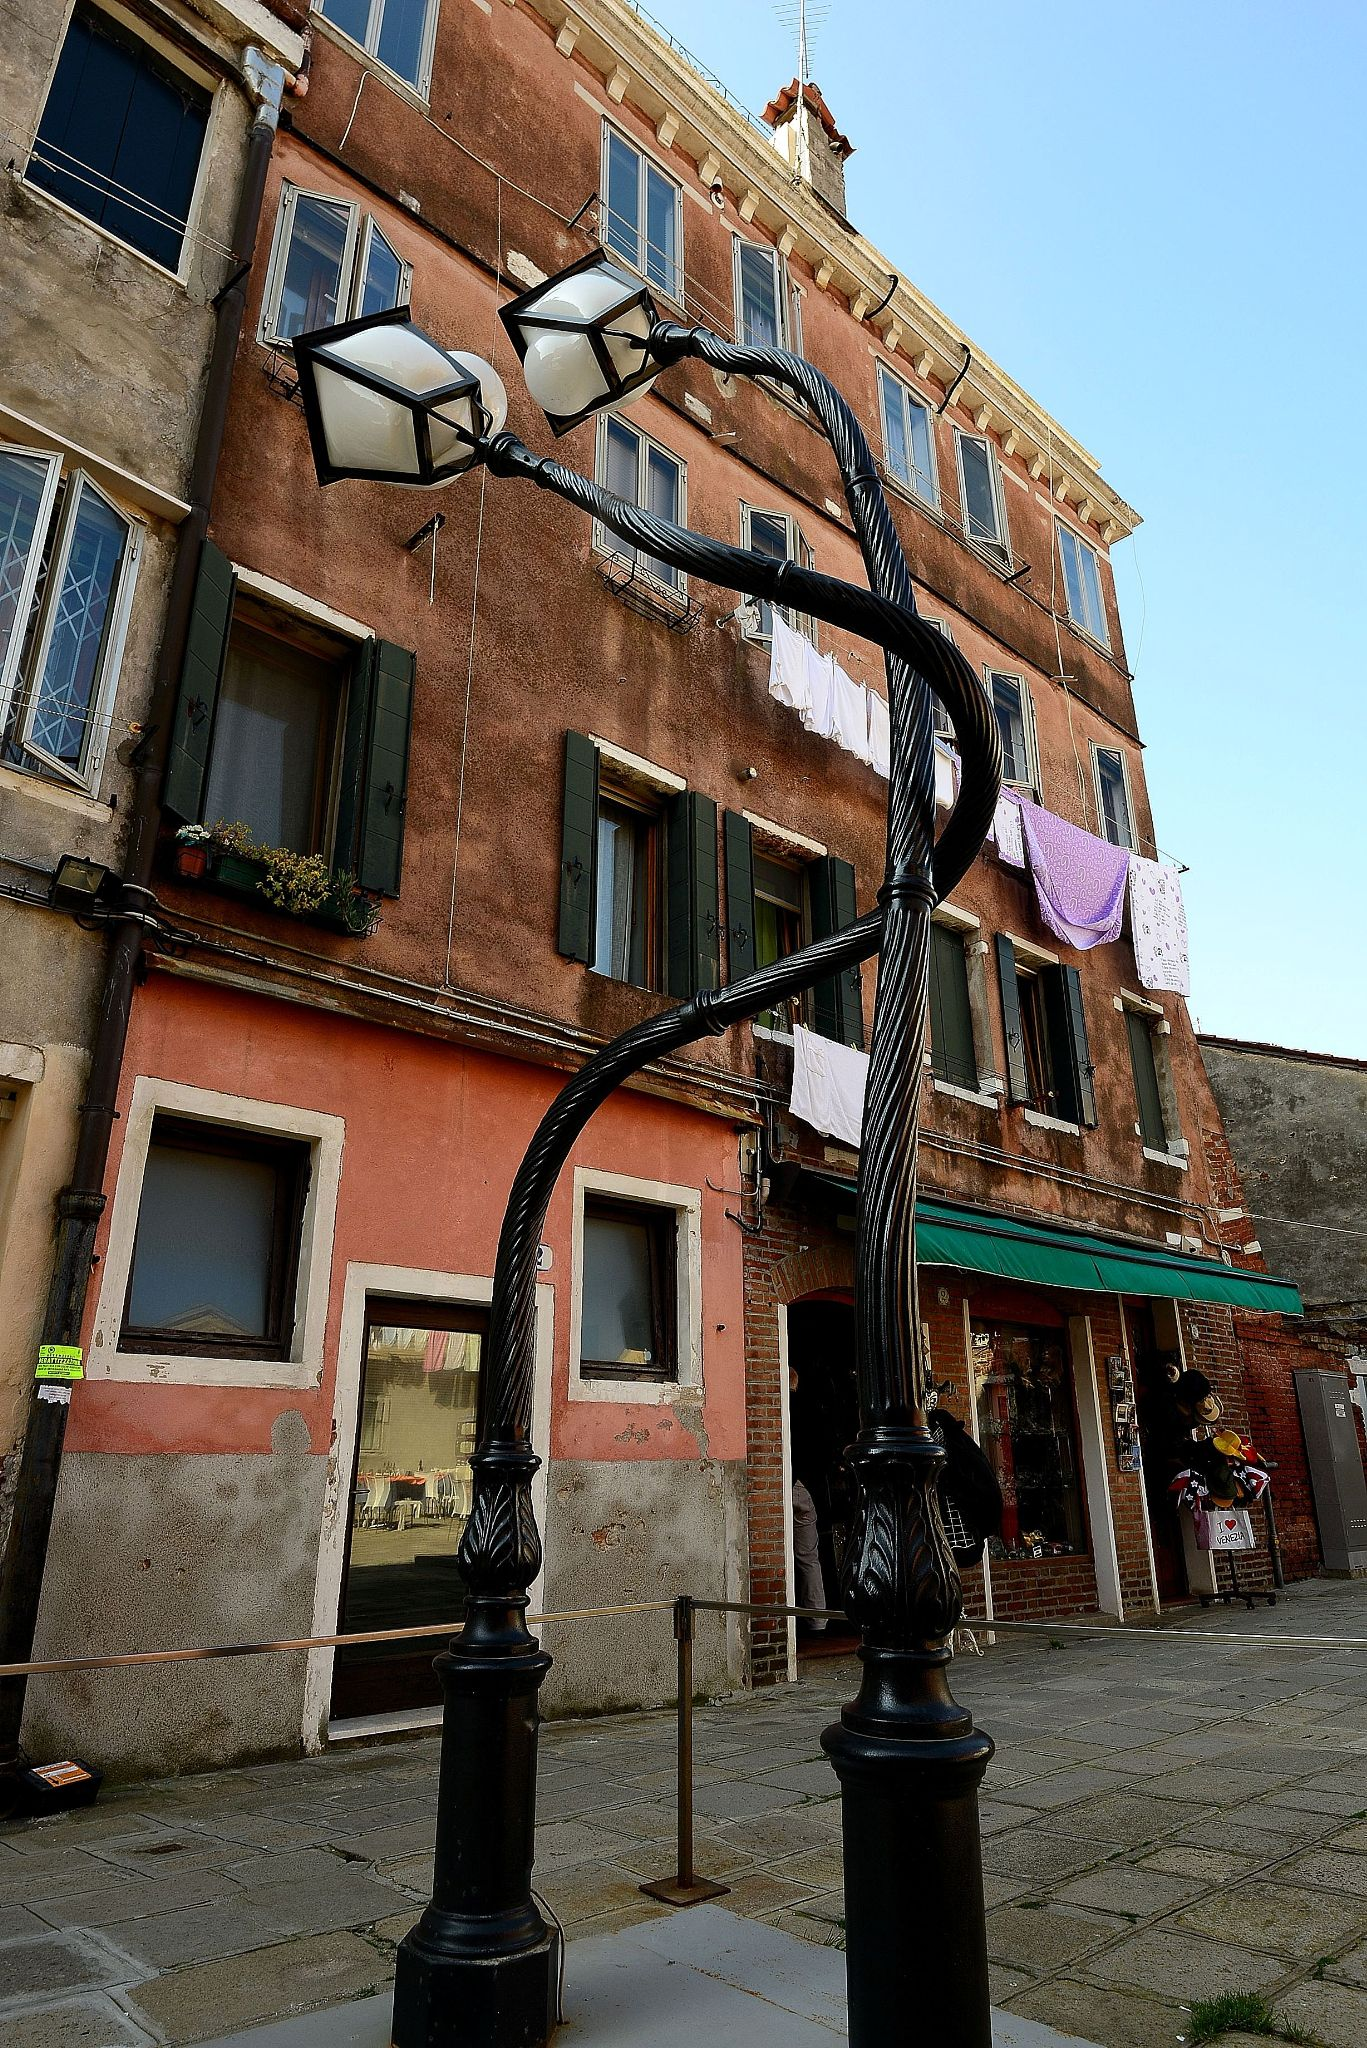 love in Murano(italy) by Ingenito Massimo